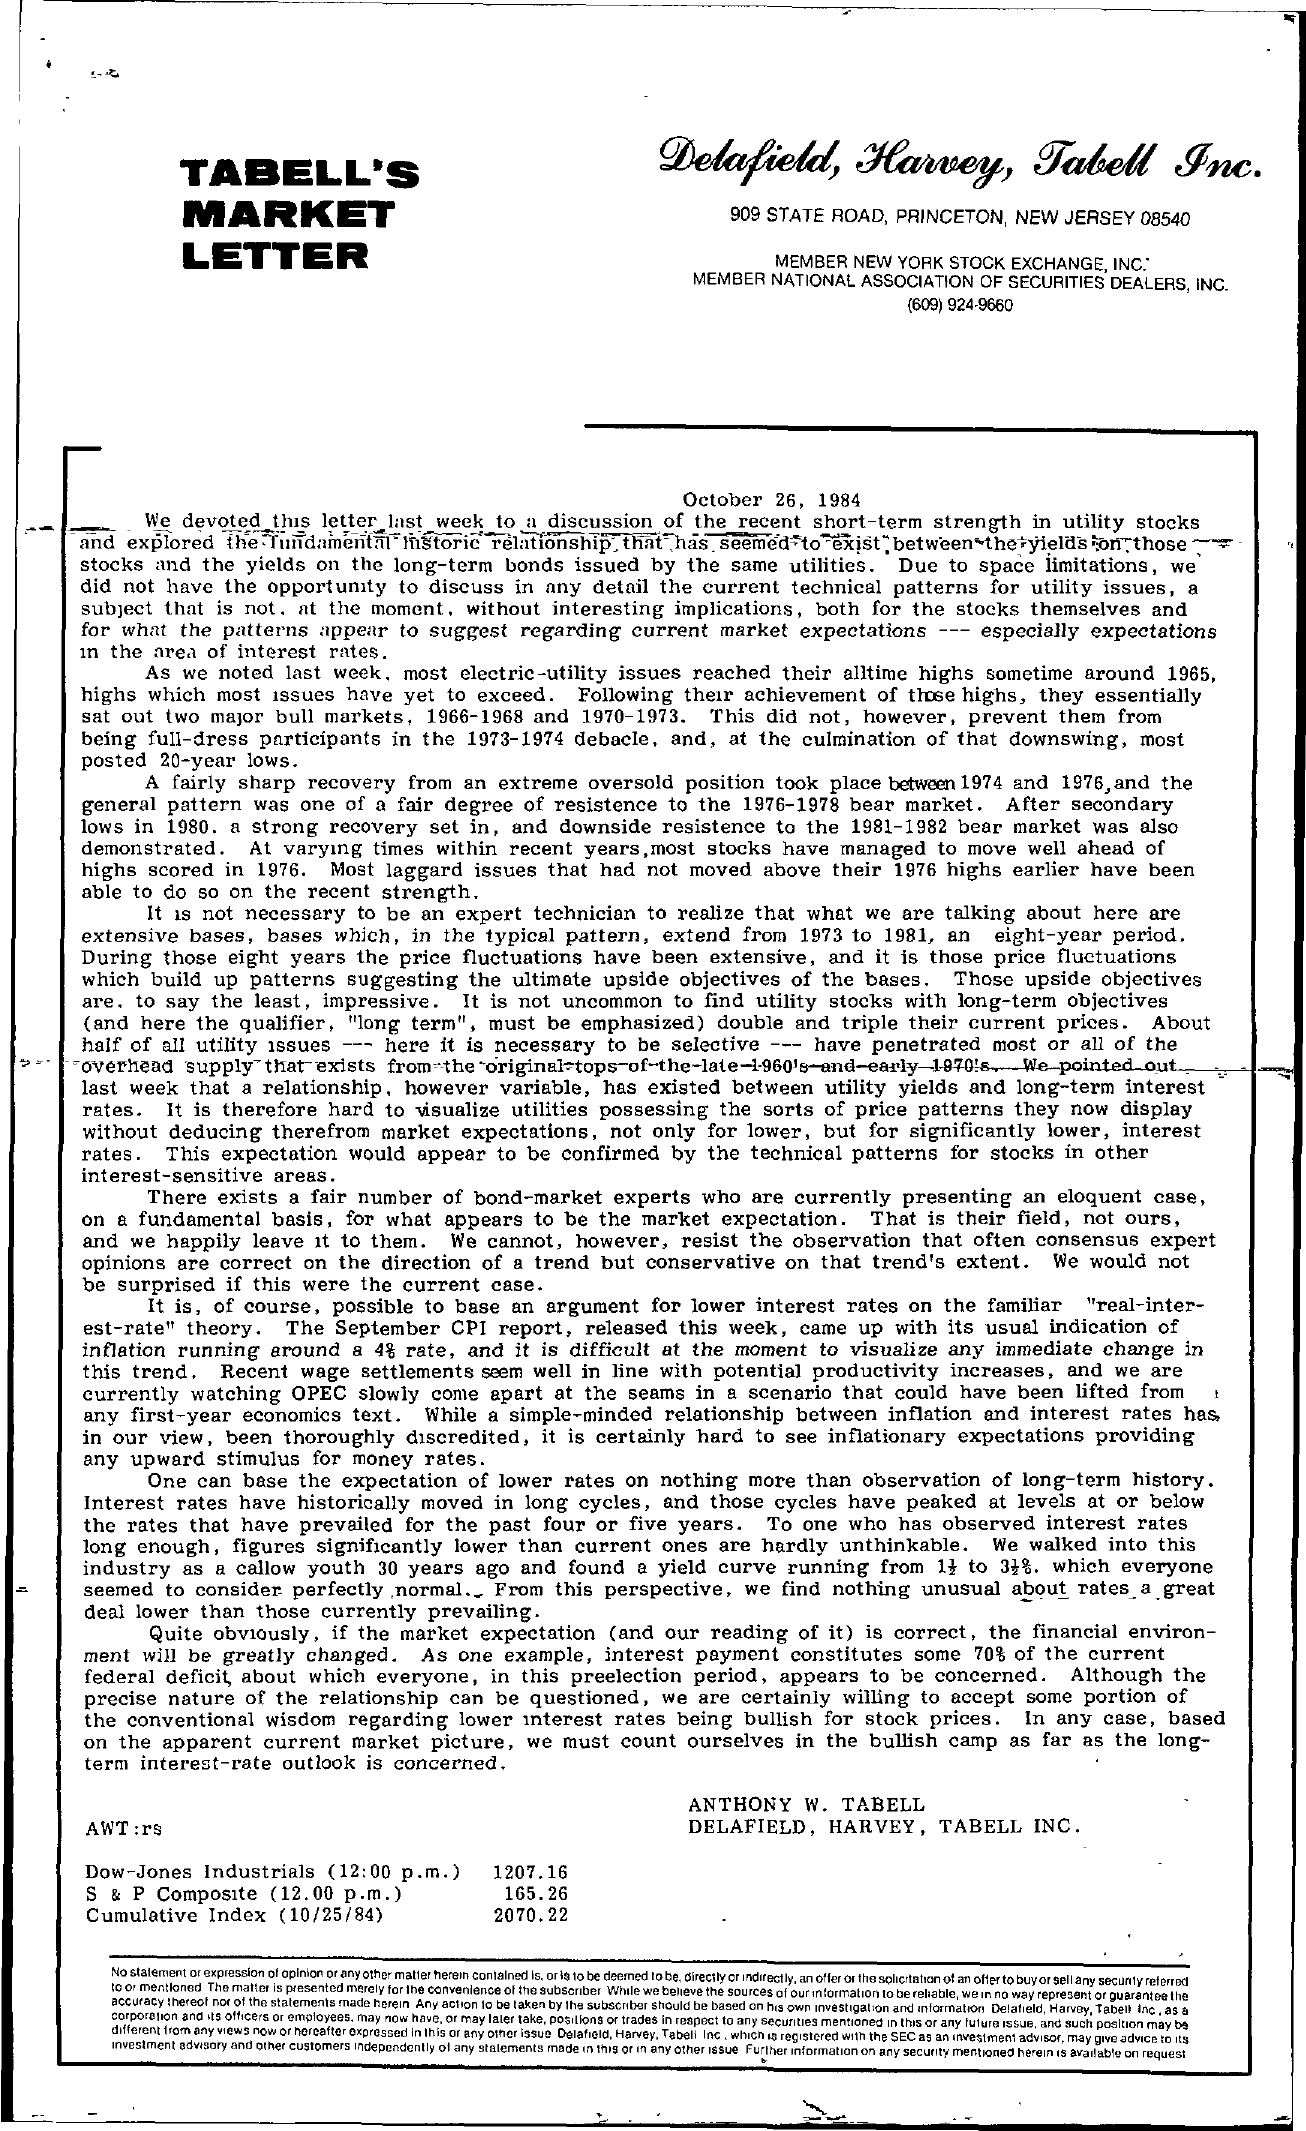 Tabell's Market Letter - October 26, 1984